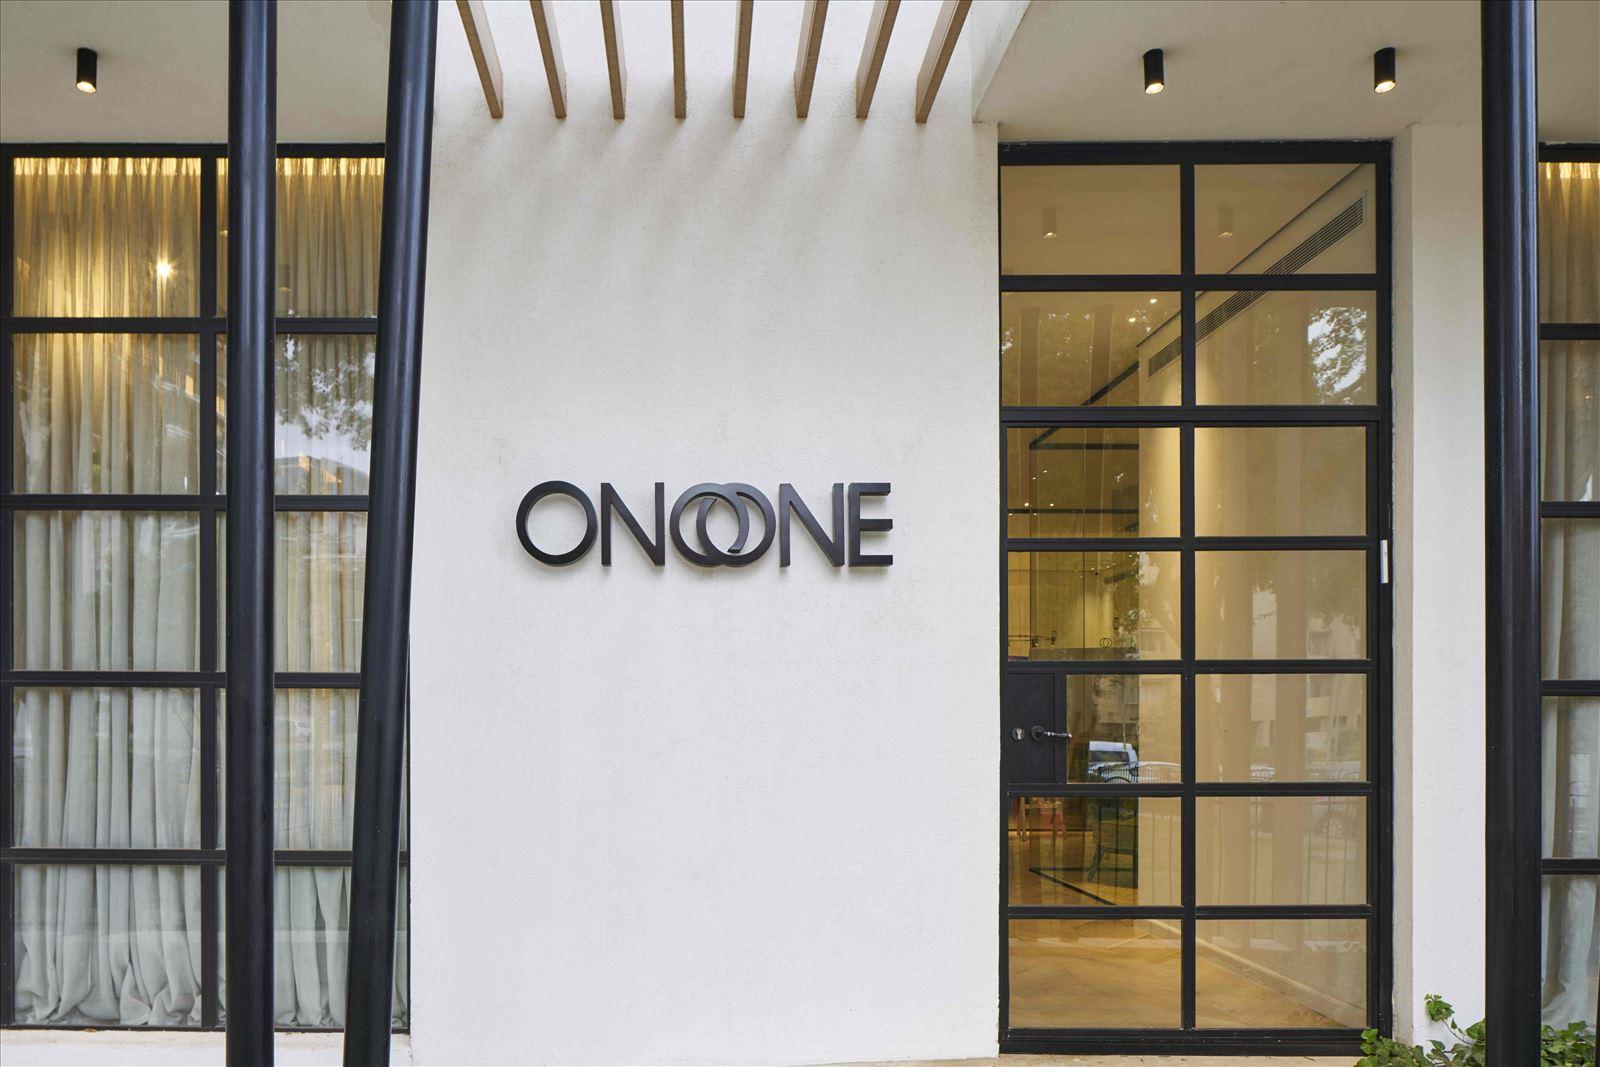 sales office - onone תמונת חוץ של התאורה שבוצעה על ידי קמחי תאורה